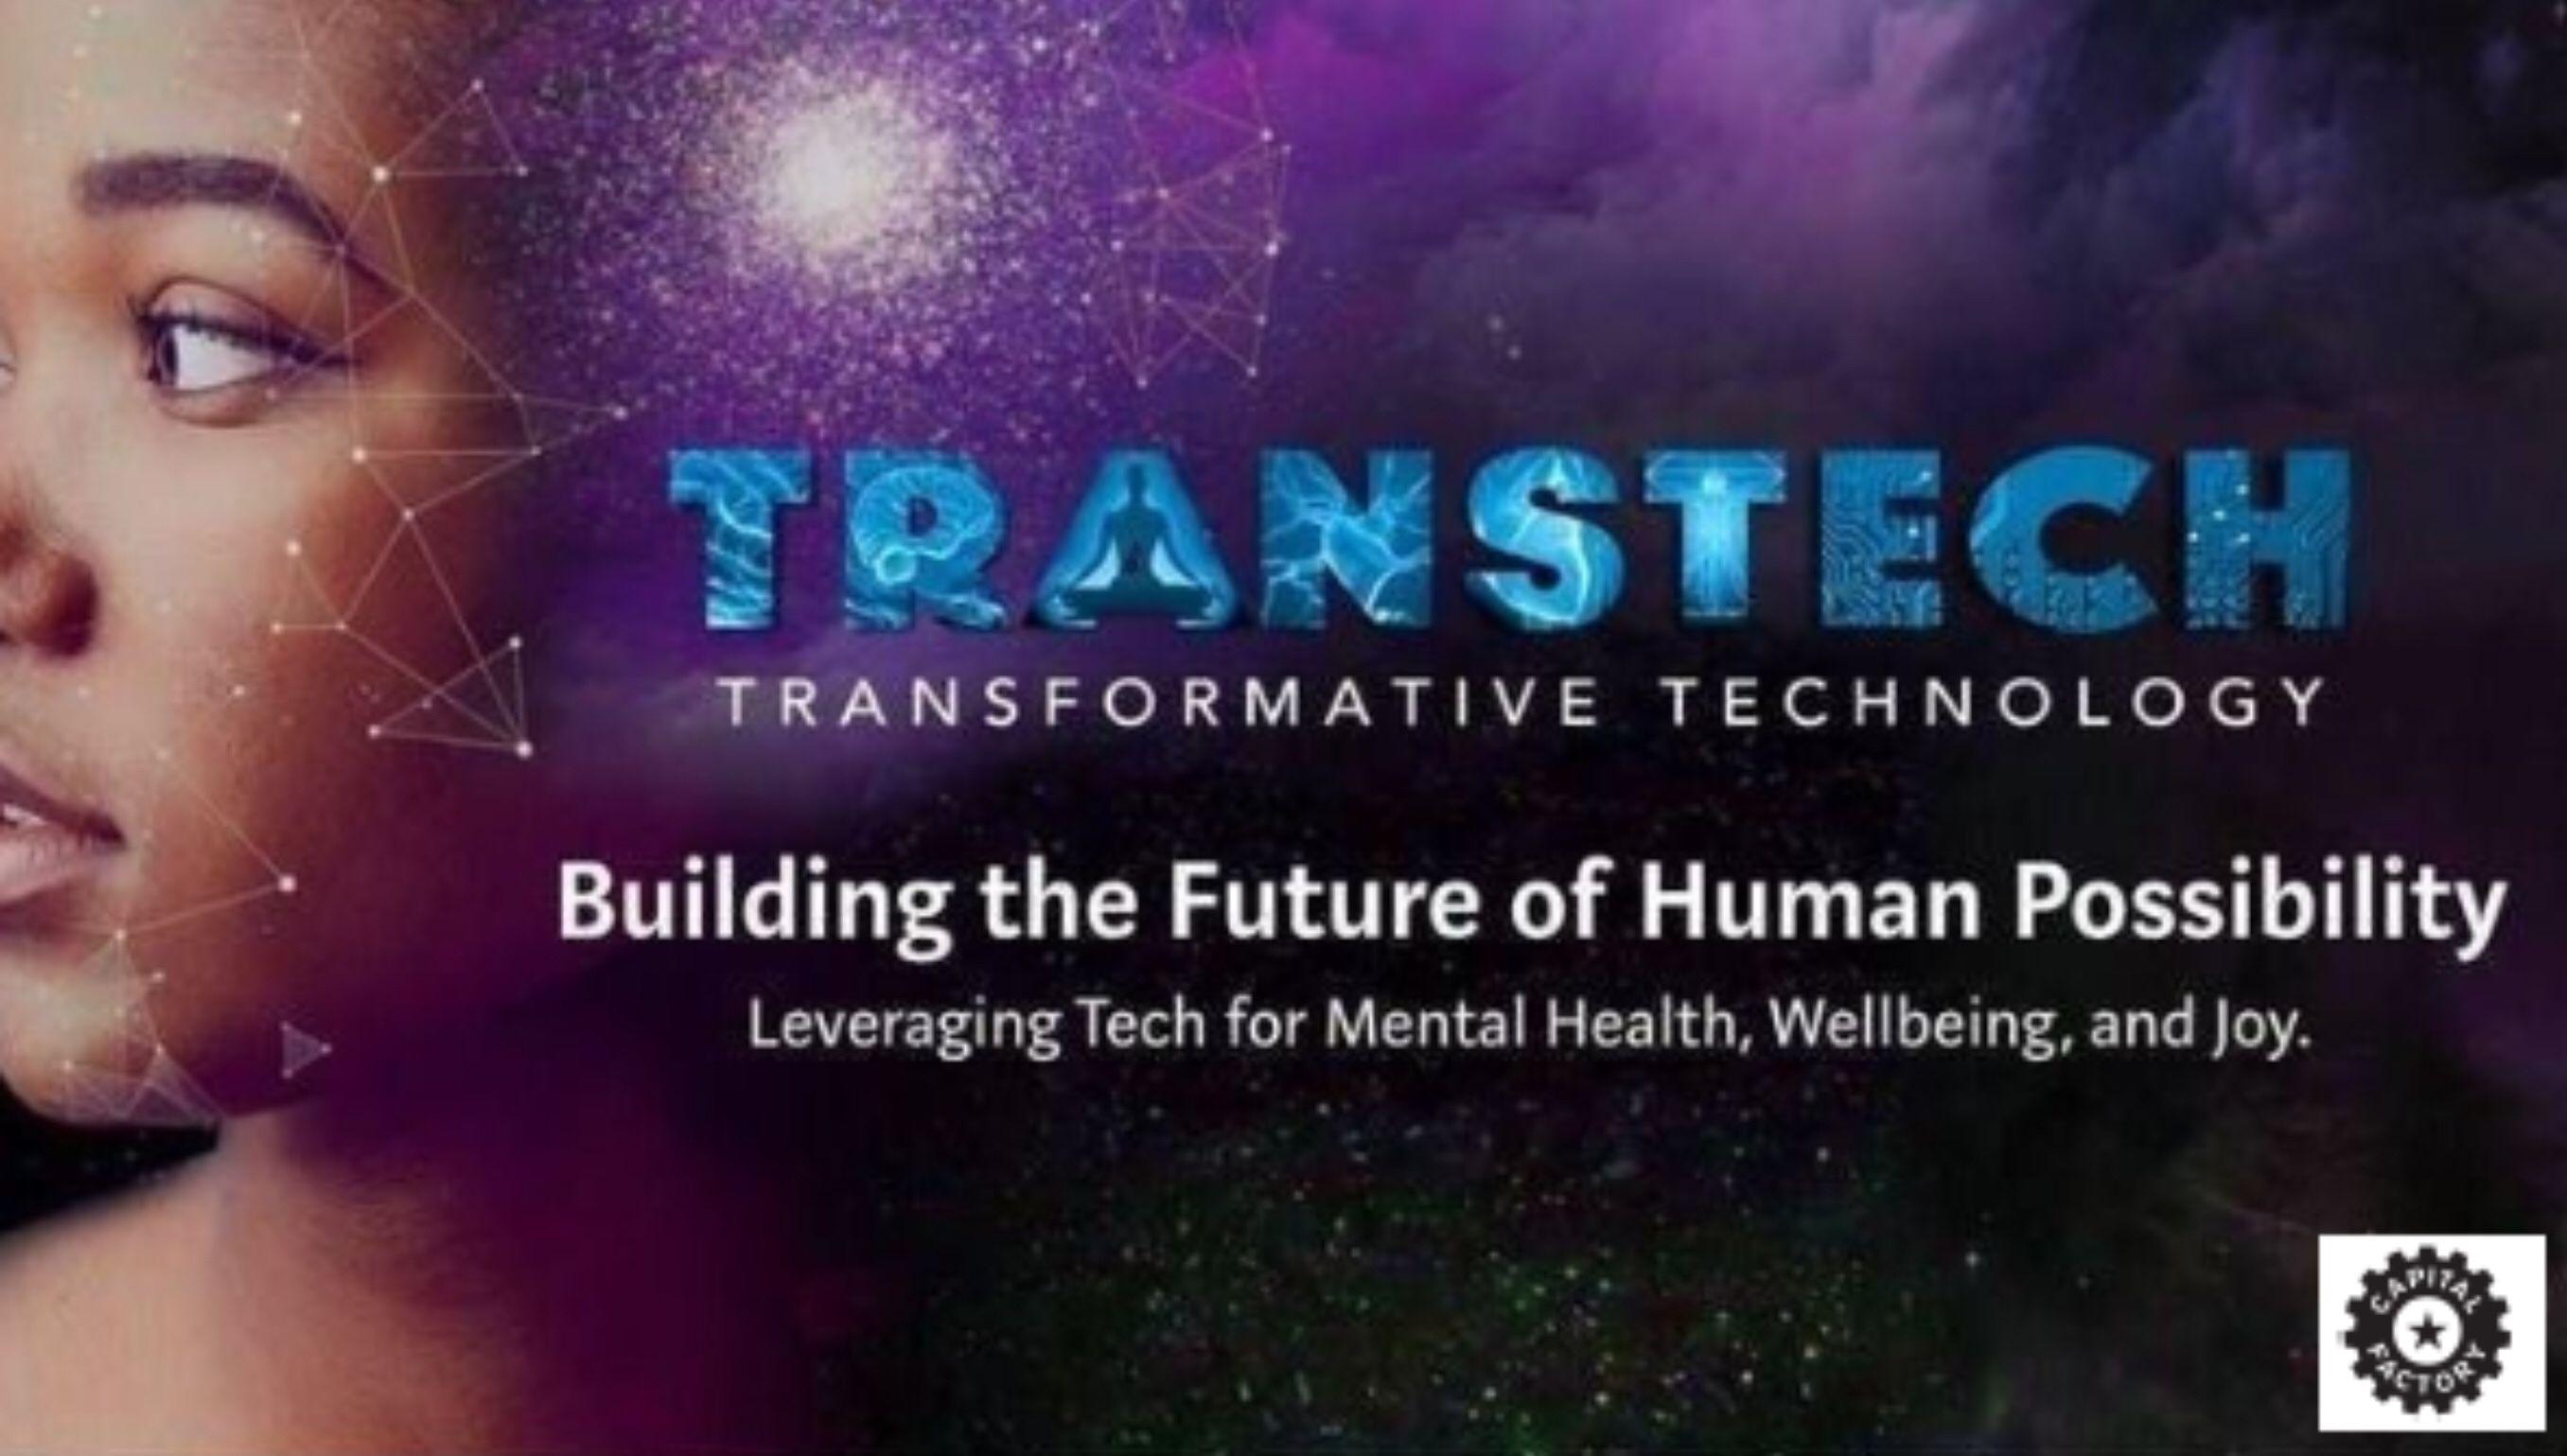 Transformative Technology Austin